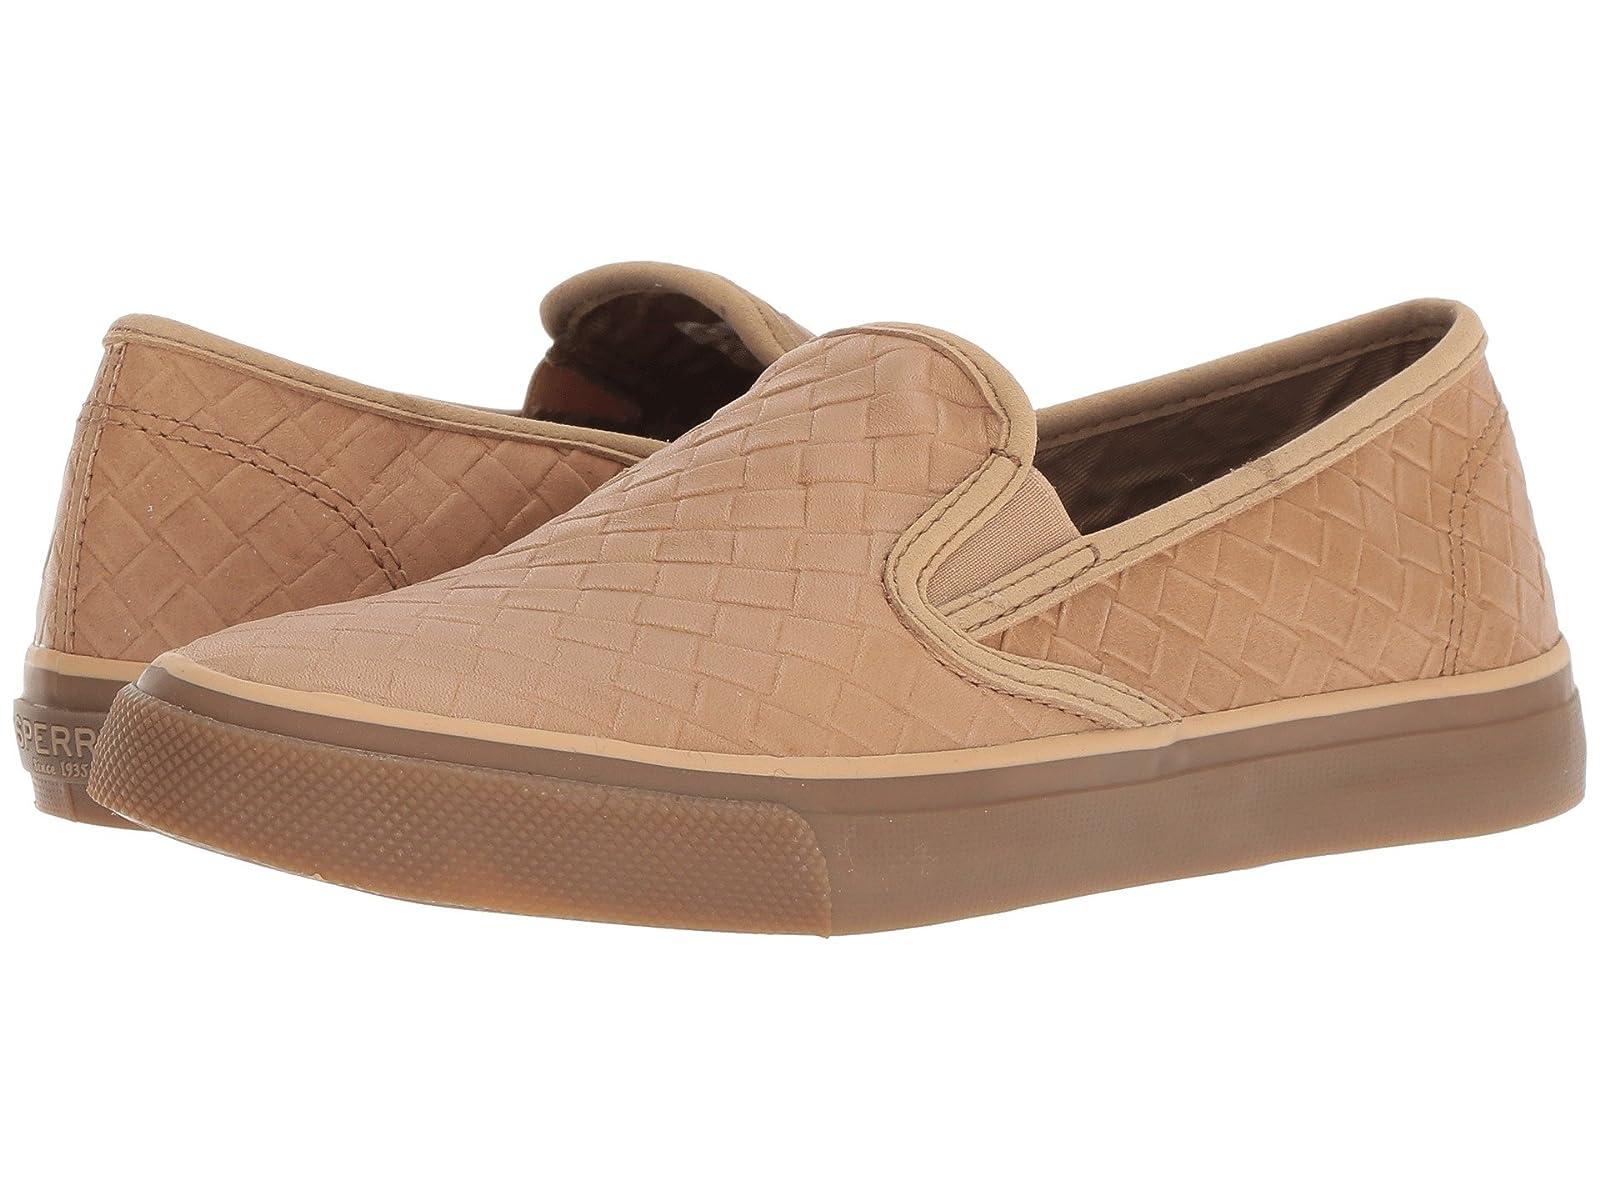 Sperry Seaside Emboss WeaveAtmospheric grades have affordable shoes